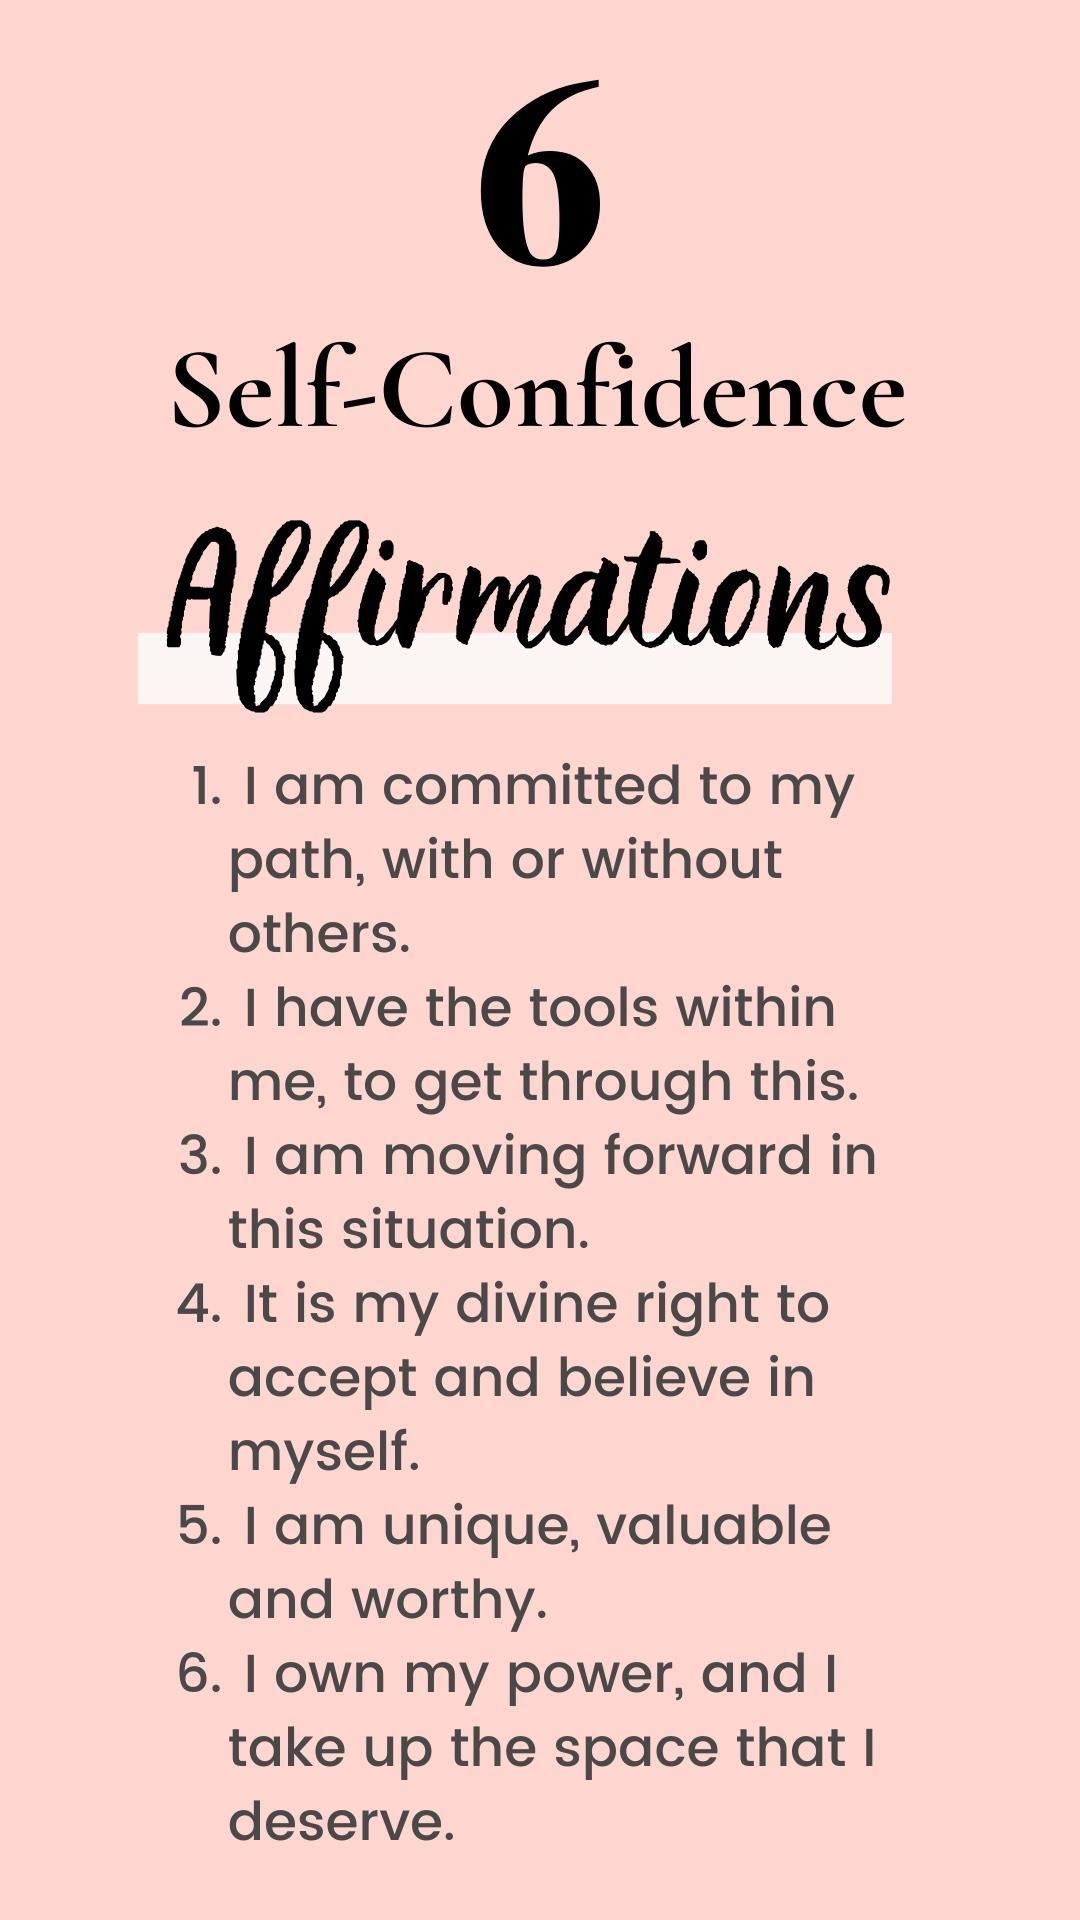 Self-Confidence Affirmations for Millennial Women.